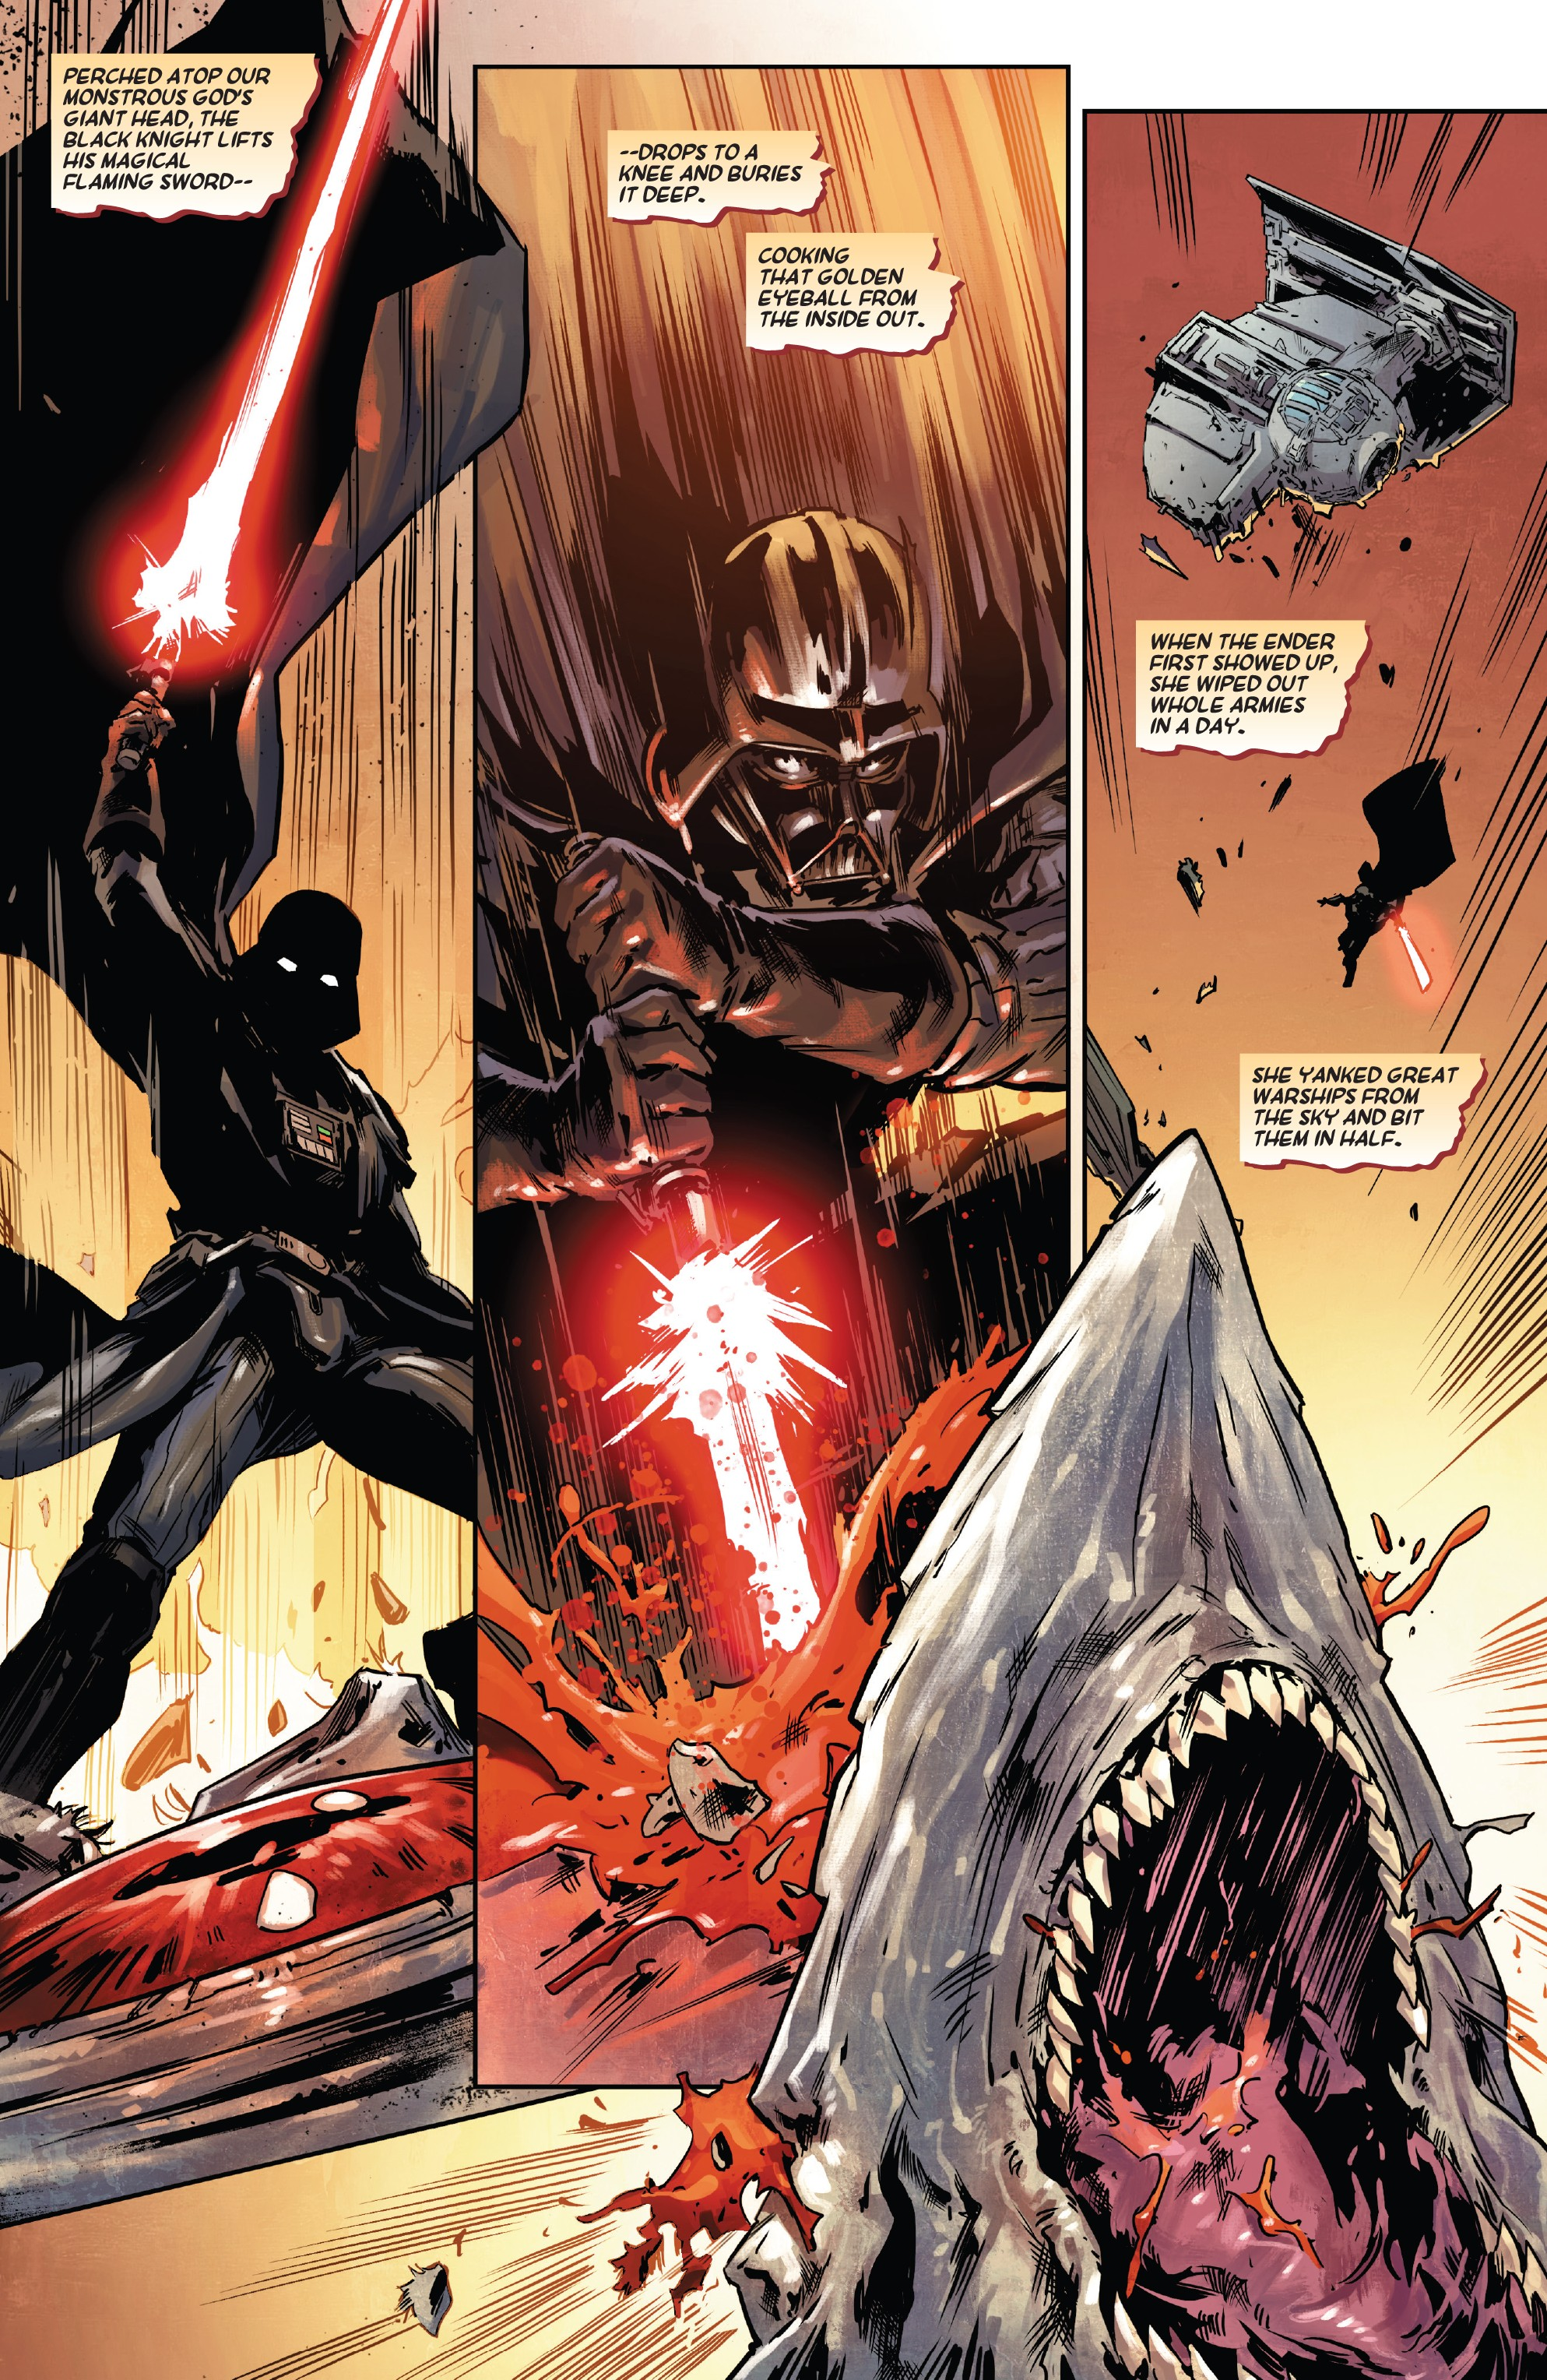 Star Wars: Vader - Dark Visions (2019) Chapter 1 - Page 12